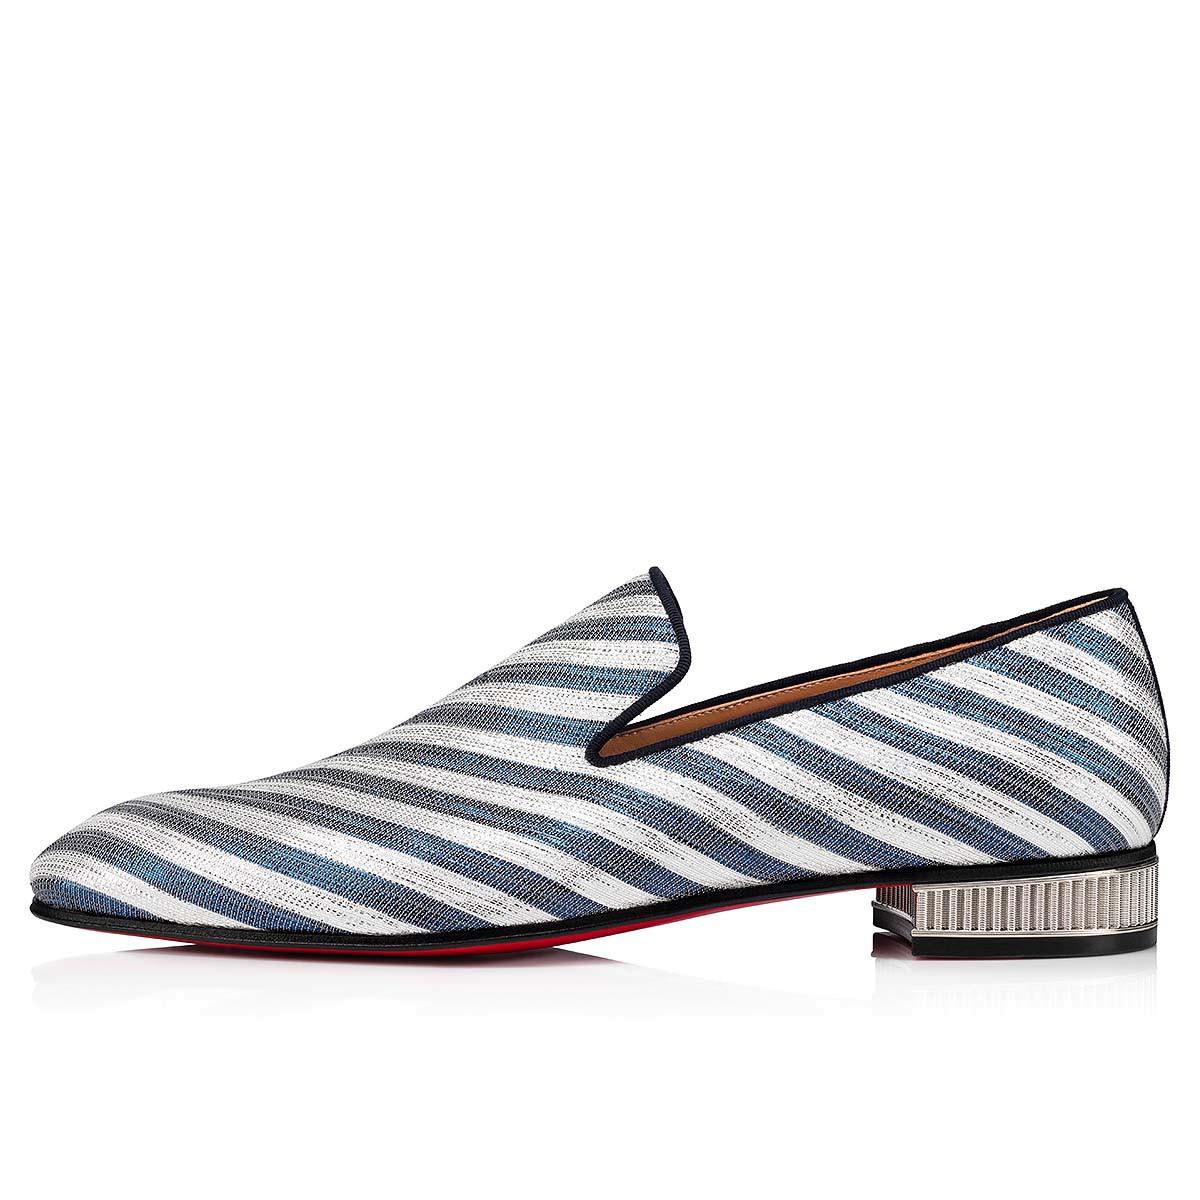 Shoes - Colonnaki Flat - Christian Louboutin